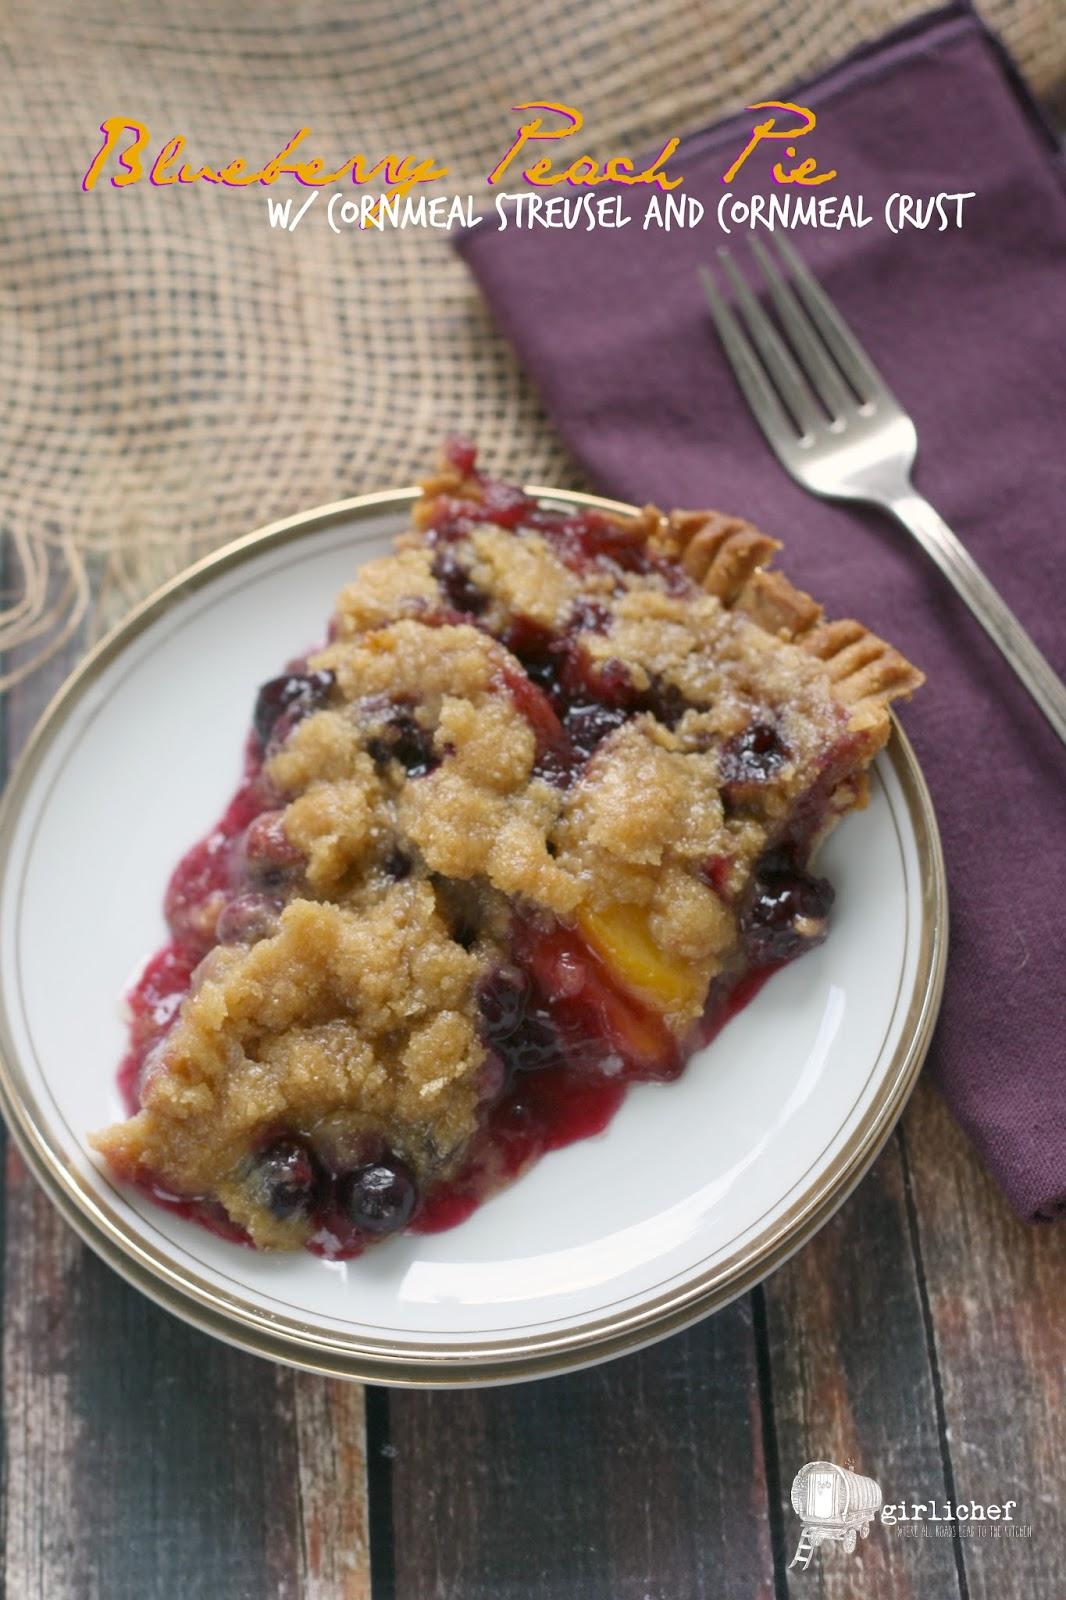 Blueberry Peach Pie w/ Cornmeal Streusel and Crust #FridayPieDay